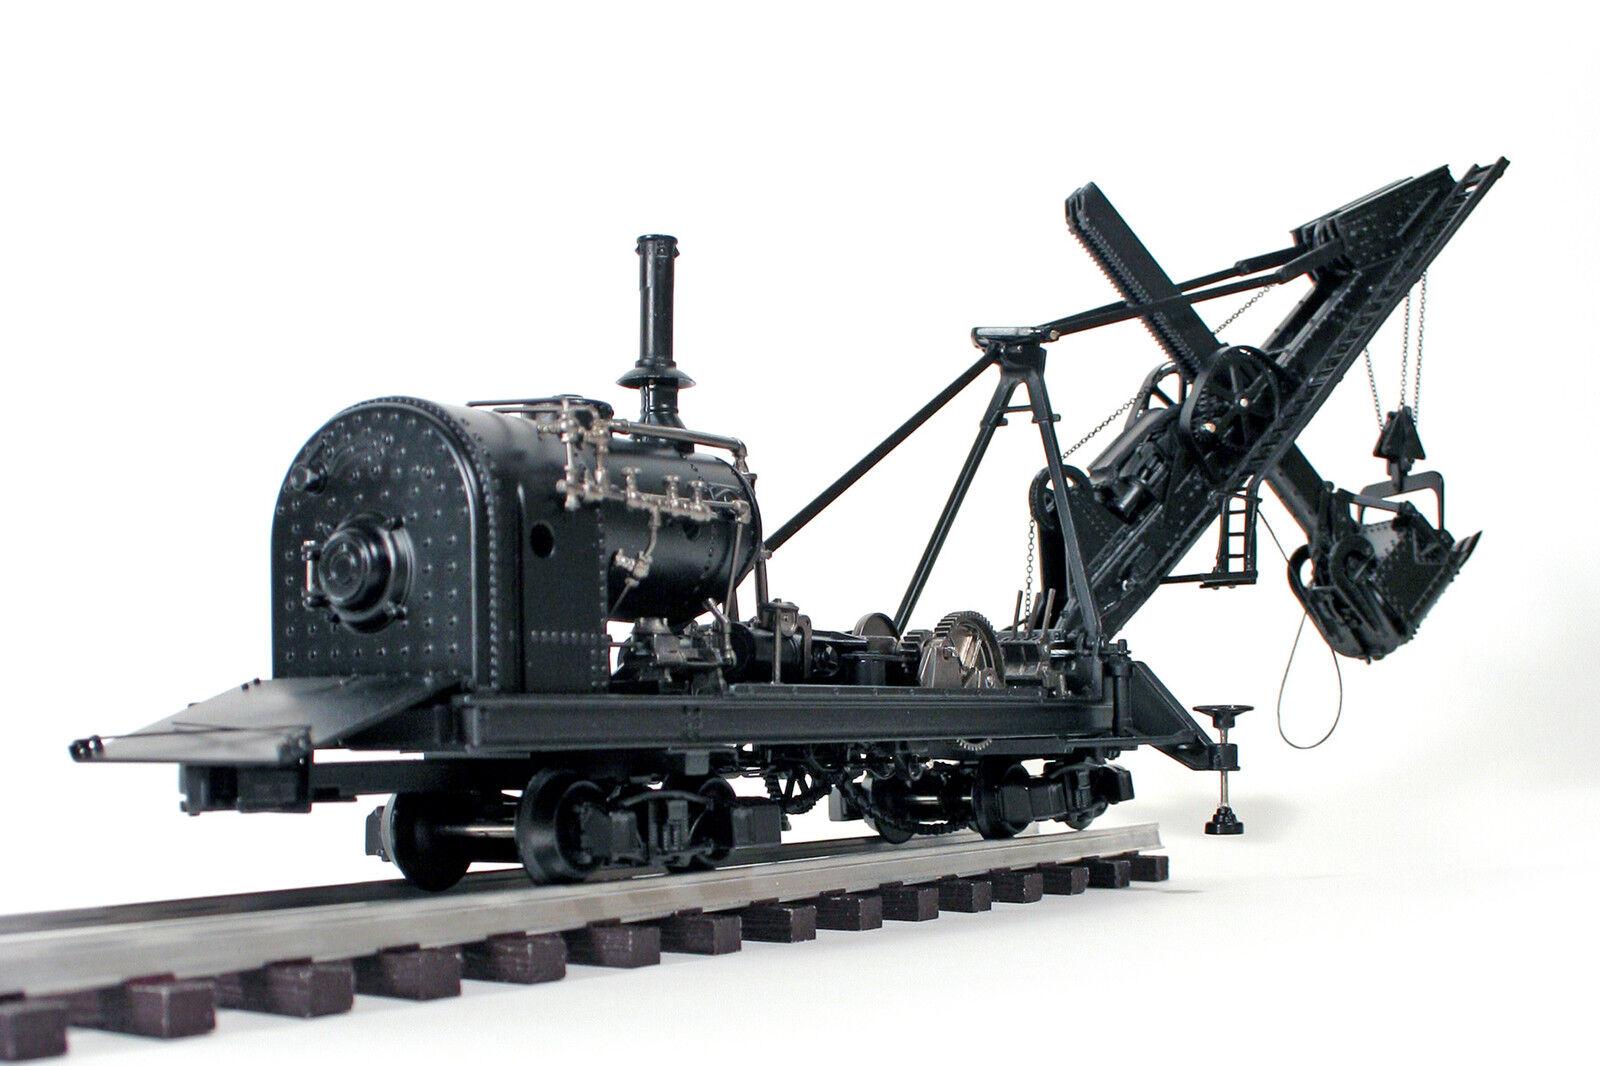 Bucyrus Steam Shovel on Rail - 1/48 - TWH #021-08001 • CAD ...